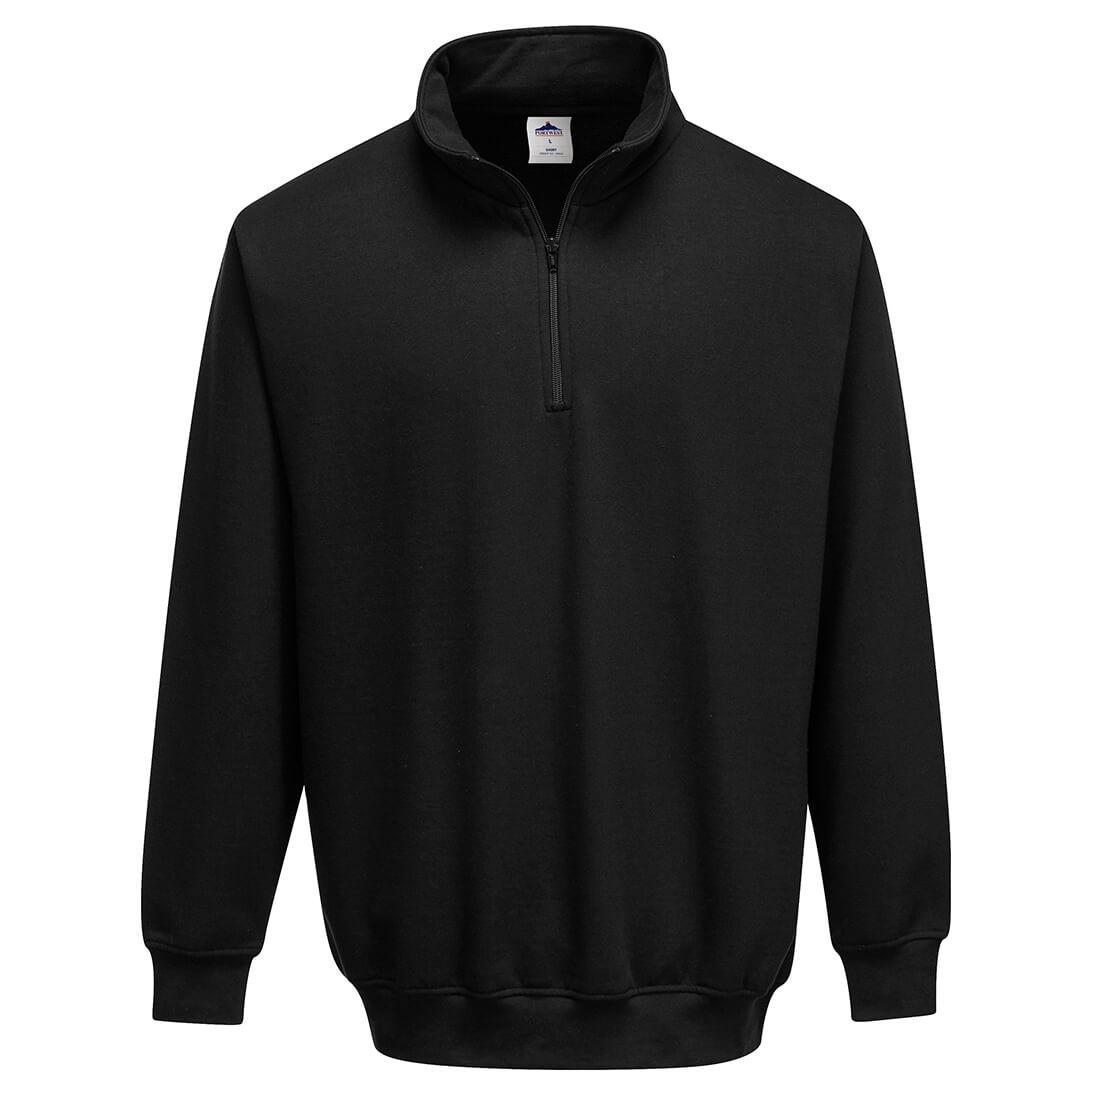 Pulover Sorrento Zip Neck - Imbracaminte de protectie